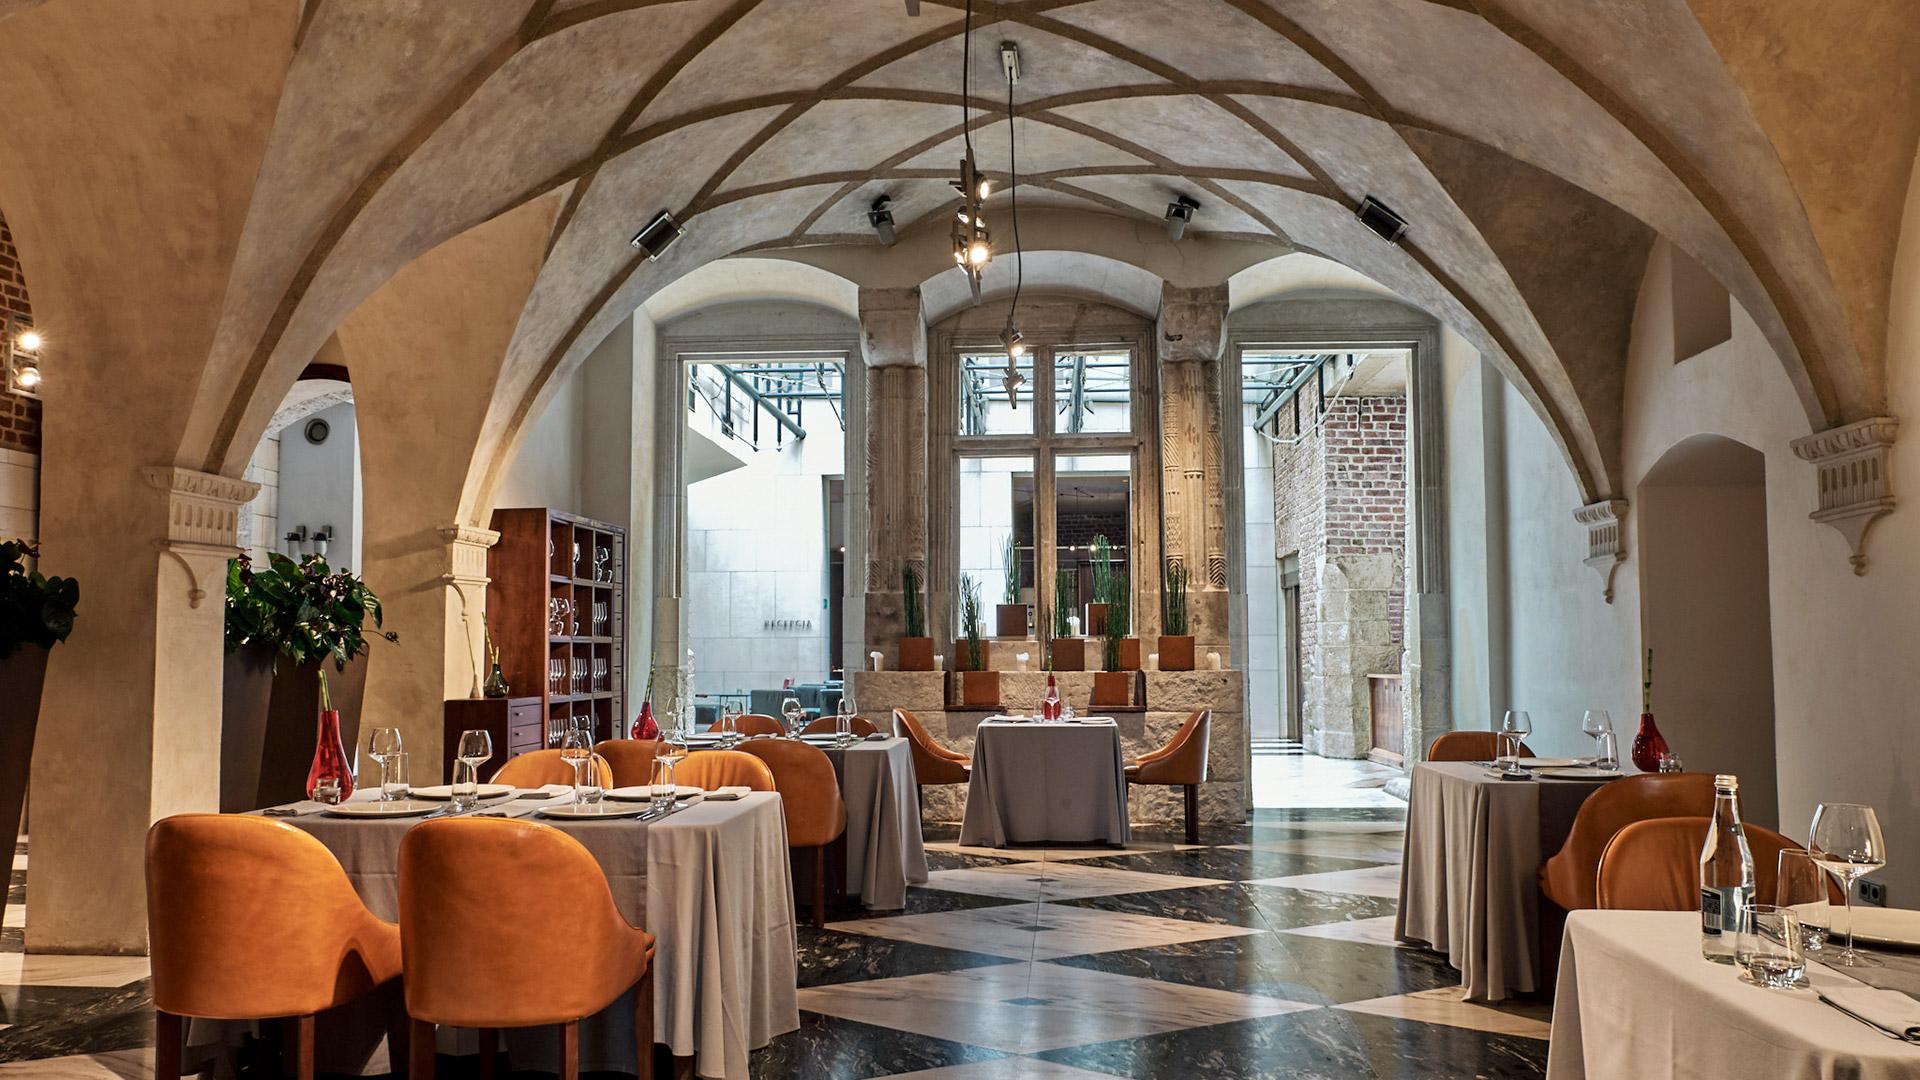 hotel-stary-krakow-laureat-nagrody-prix-villegiature-najpiekniejsze-wnetrze-hotelowe-w-Europie (28)(1)